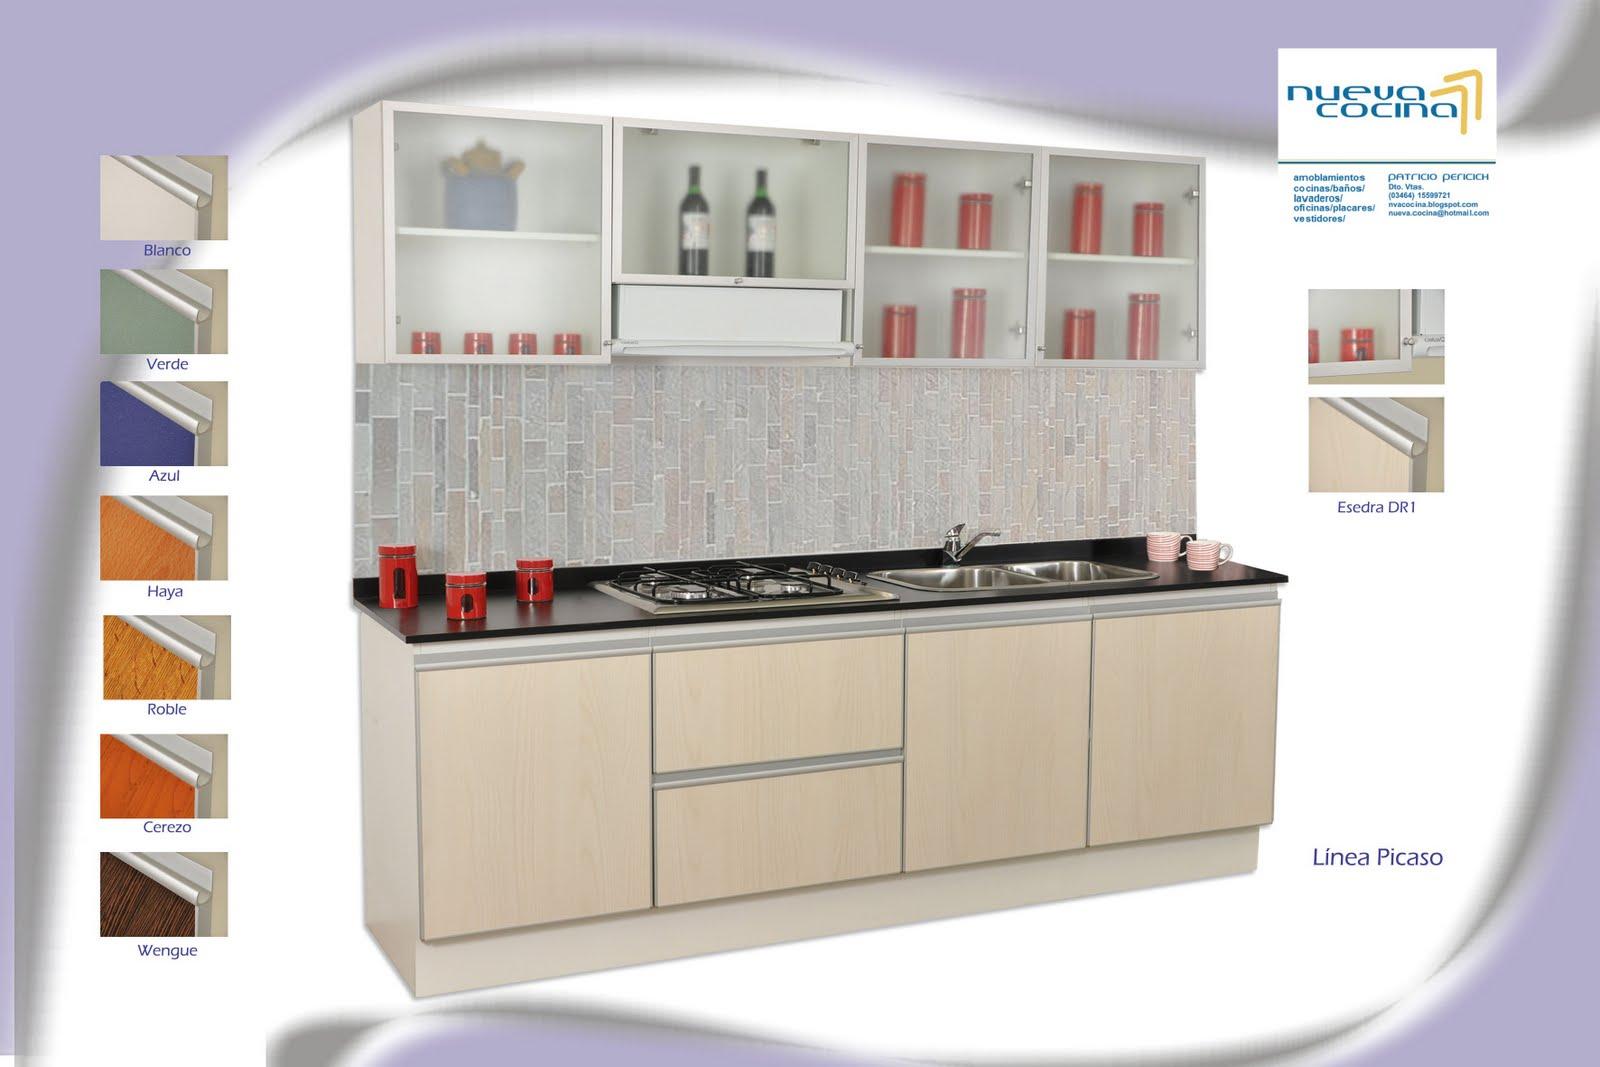 Muebles de cocina muebles para ba o muebles de for Severino muebles cocina alacena melamina blanca